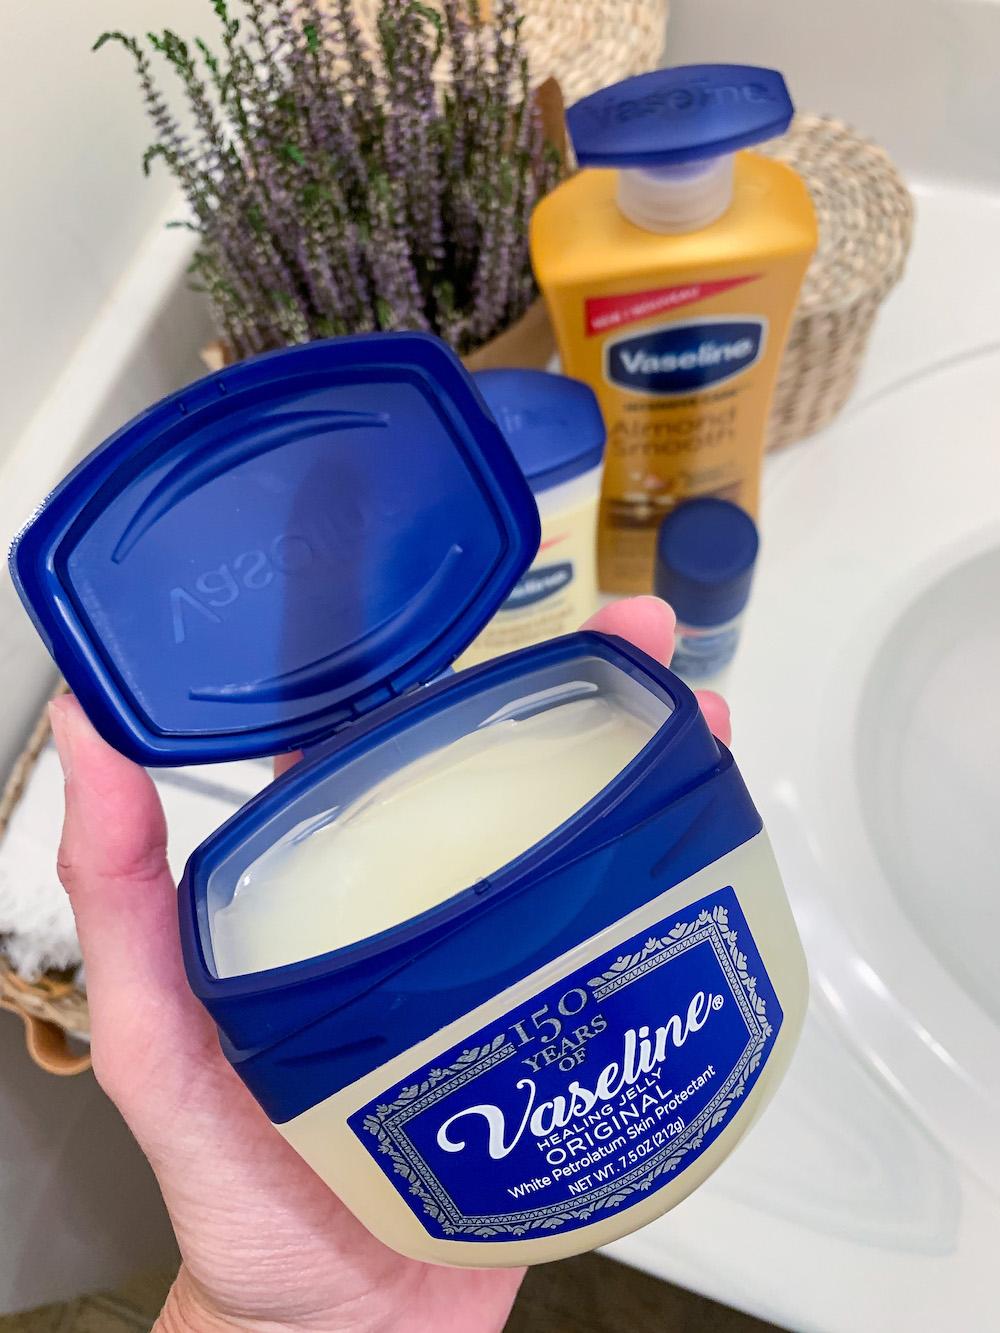 Classic Vaseline Petroleum Jelly